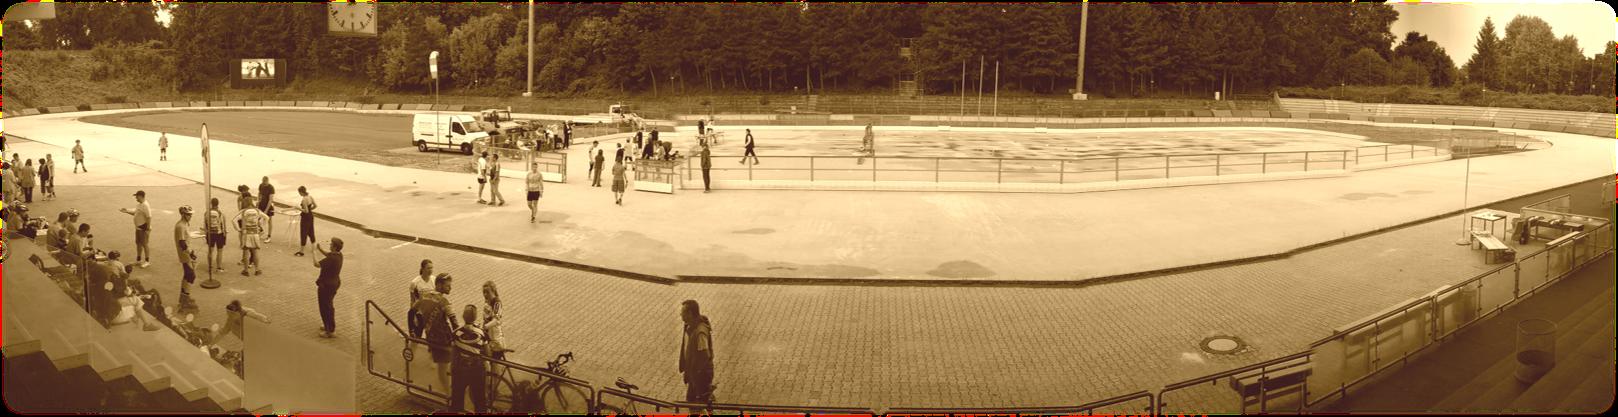 Eisstadion Wilmersdorf